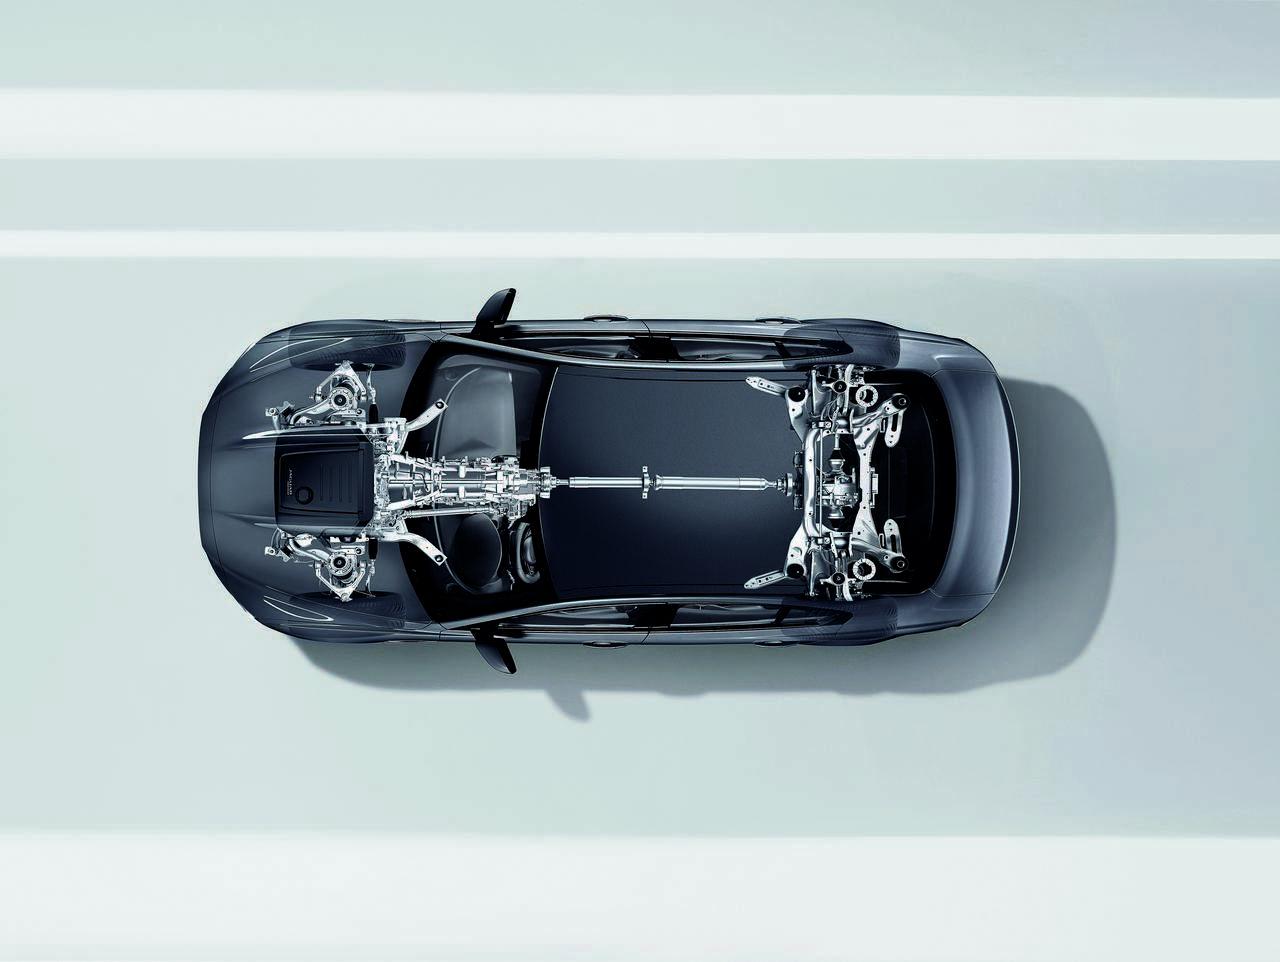 jaguar-xe-AWD-trazione-integrale_0-100_10